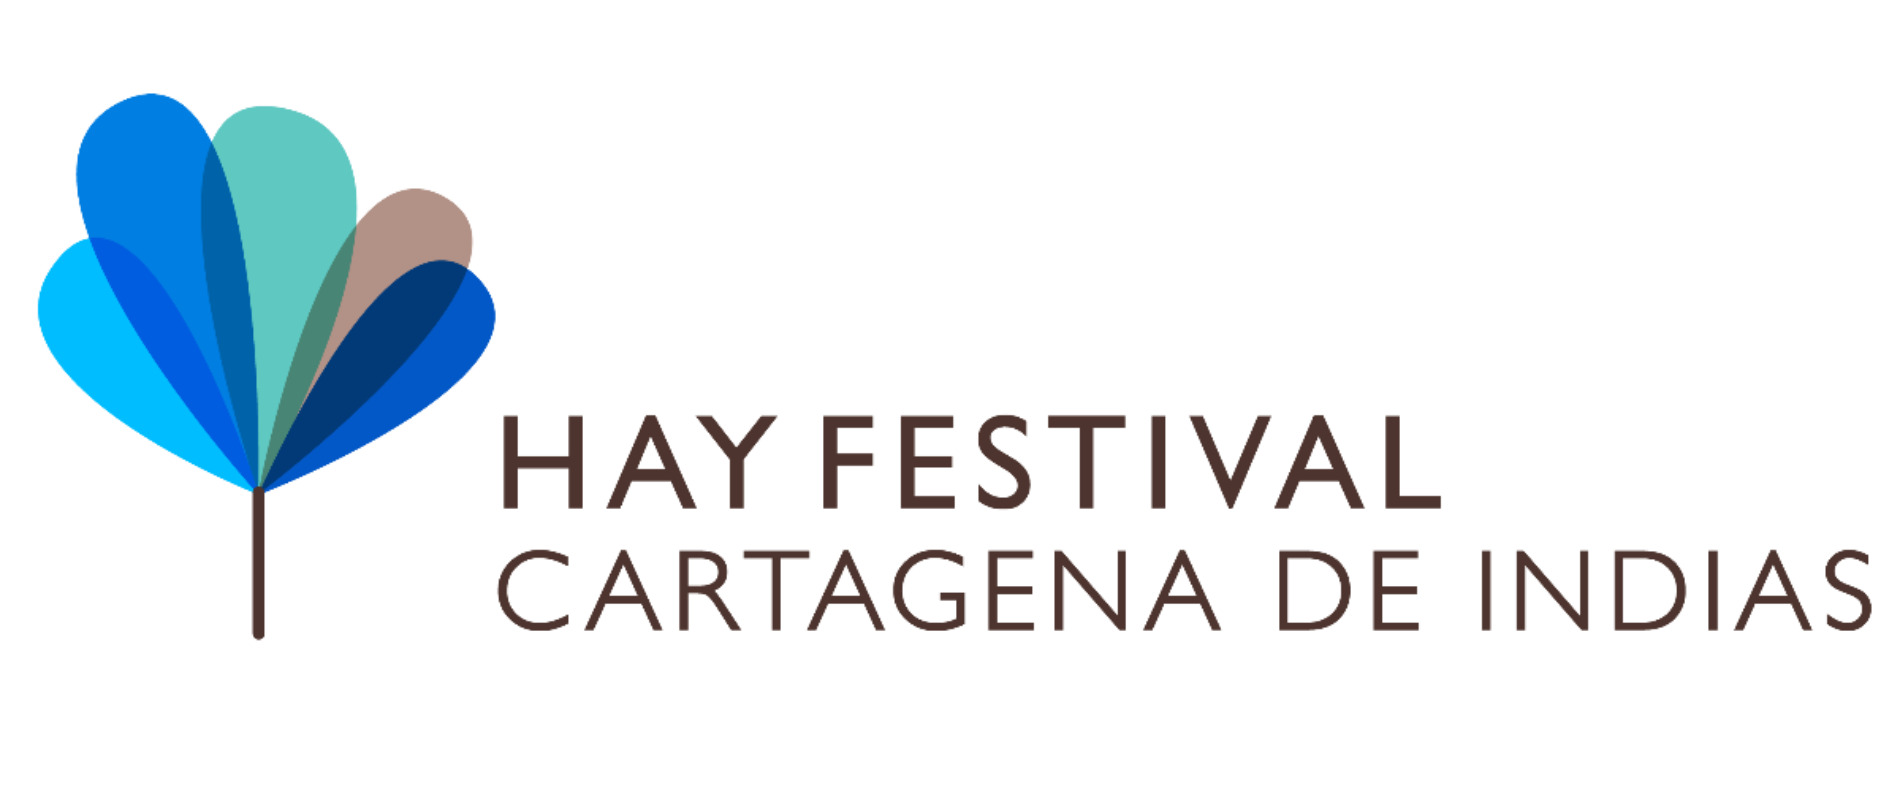 Hay Festival inicia su programa digital #Imaginaelmundo